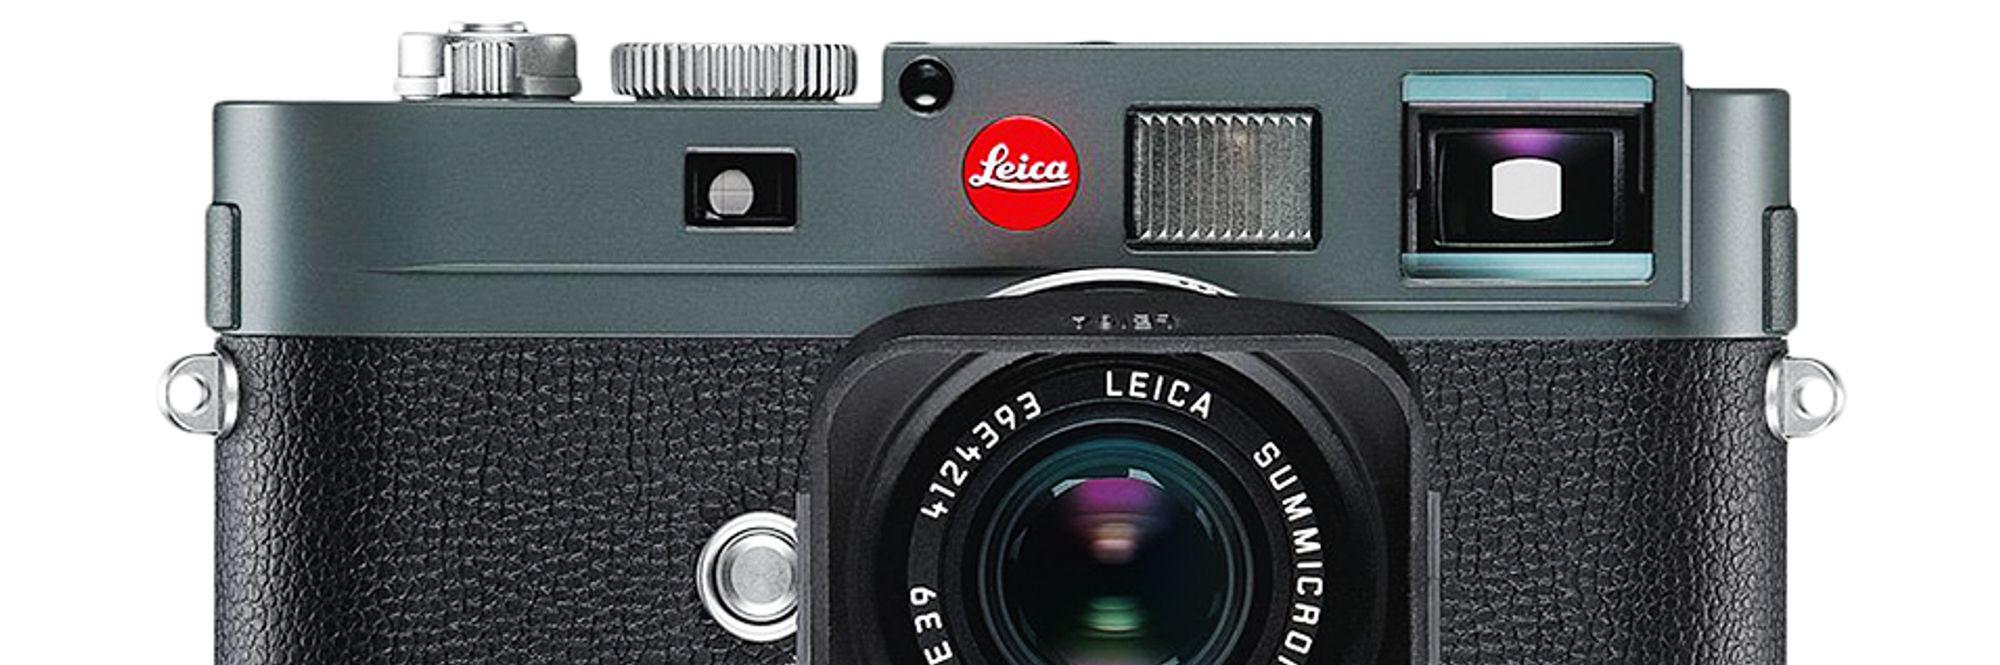 Leica M-E avduket